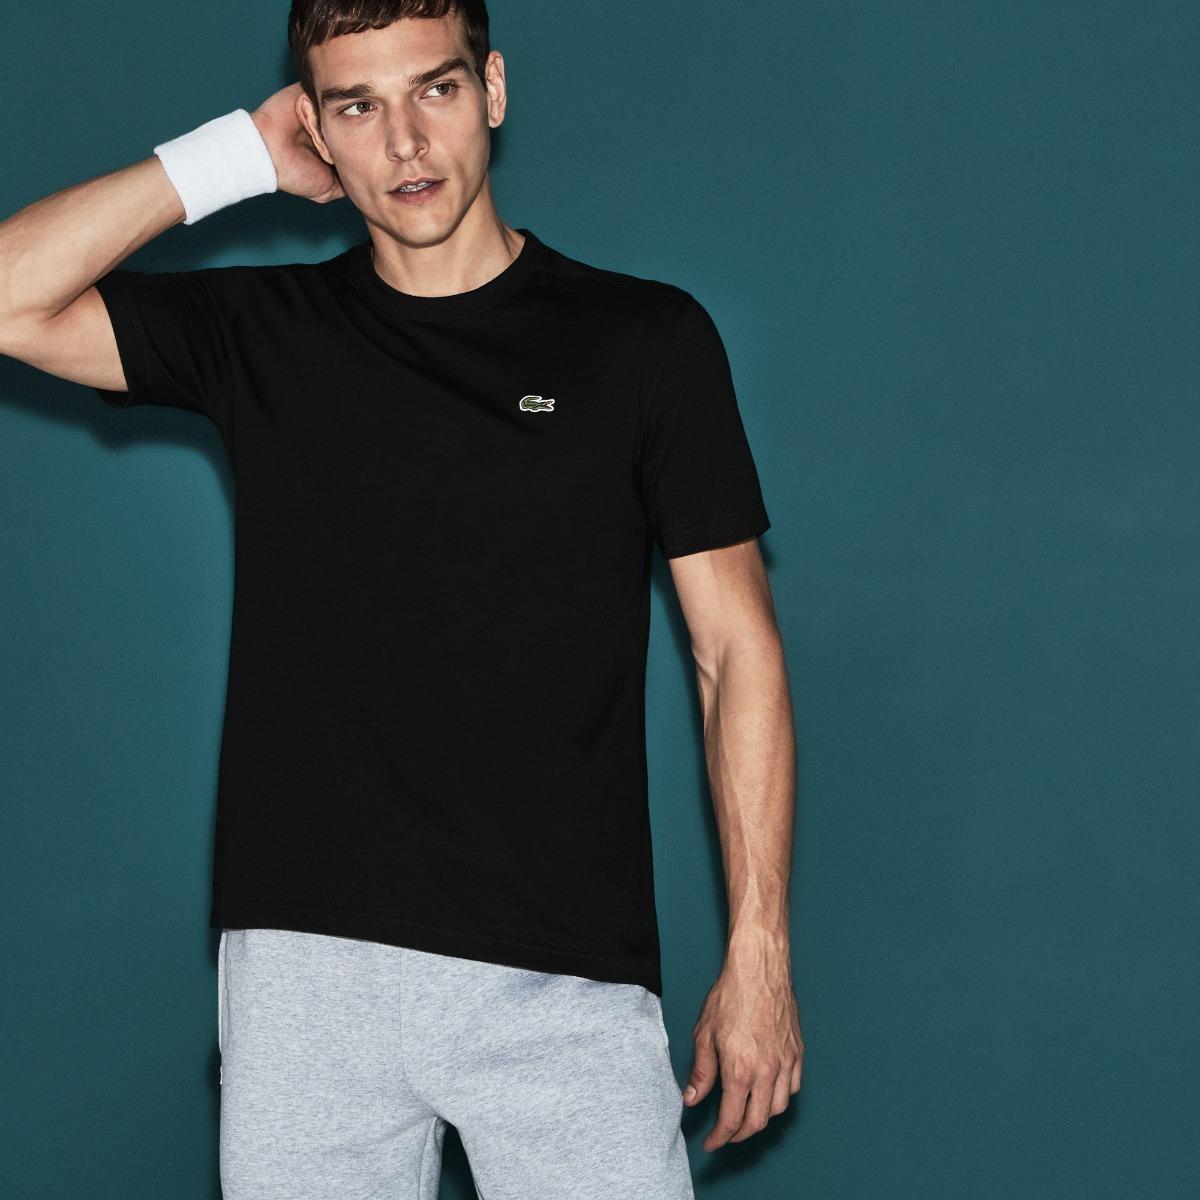 a9942d12b3523 camiseta lacoste ultra dry sport de jersey tecnológico. Carregando zoom.